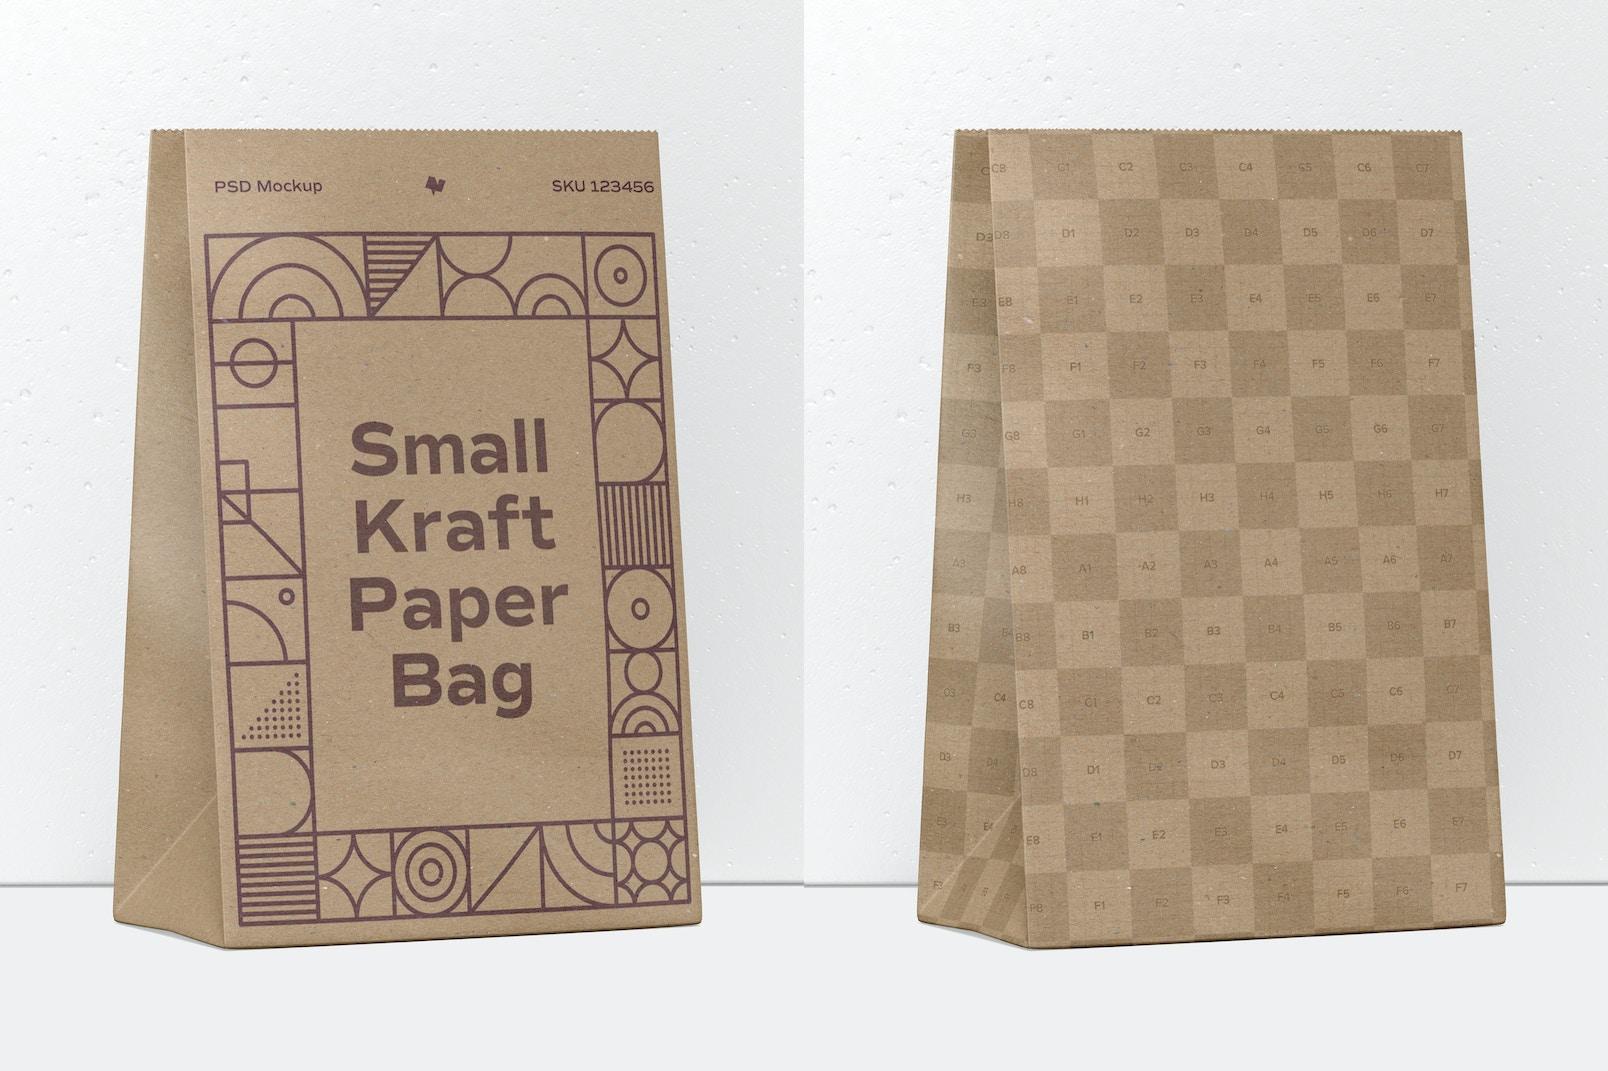 Small Kraft Paper Bag Mockup, Perspective